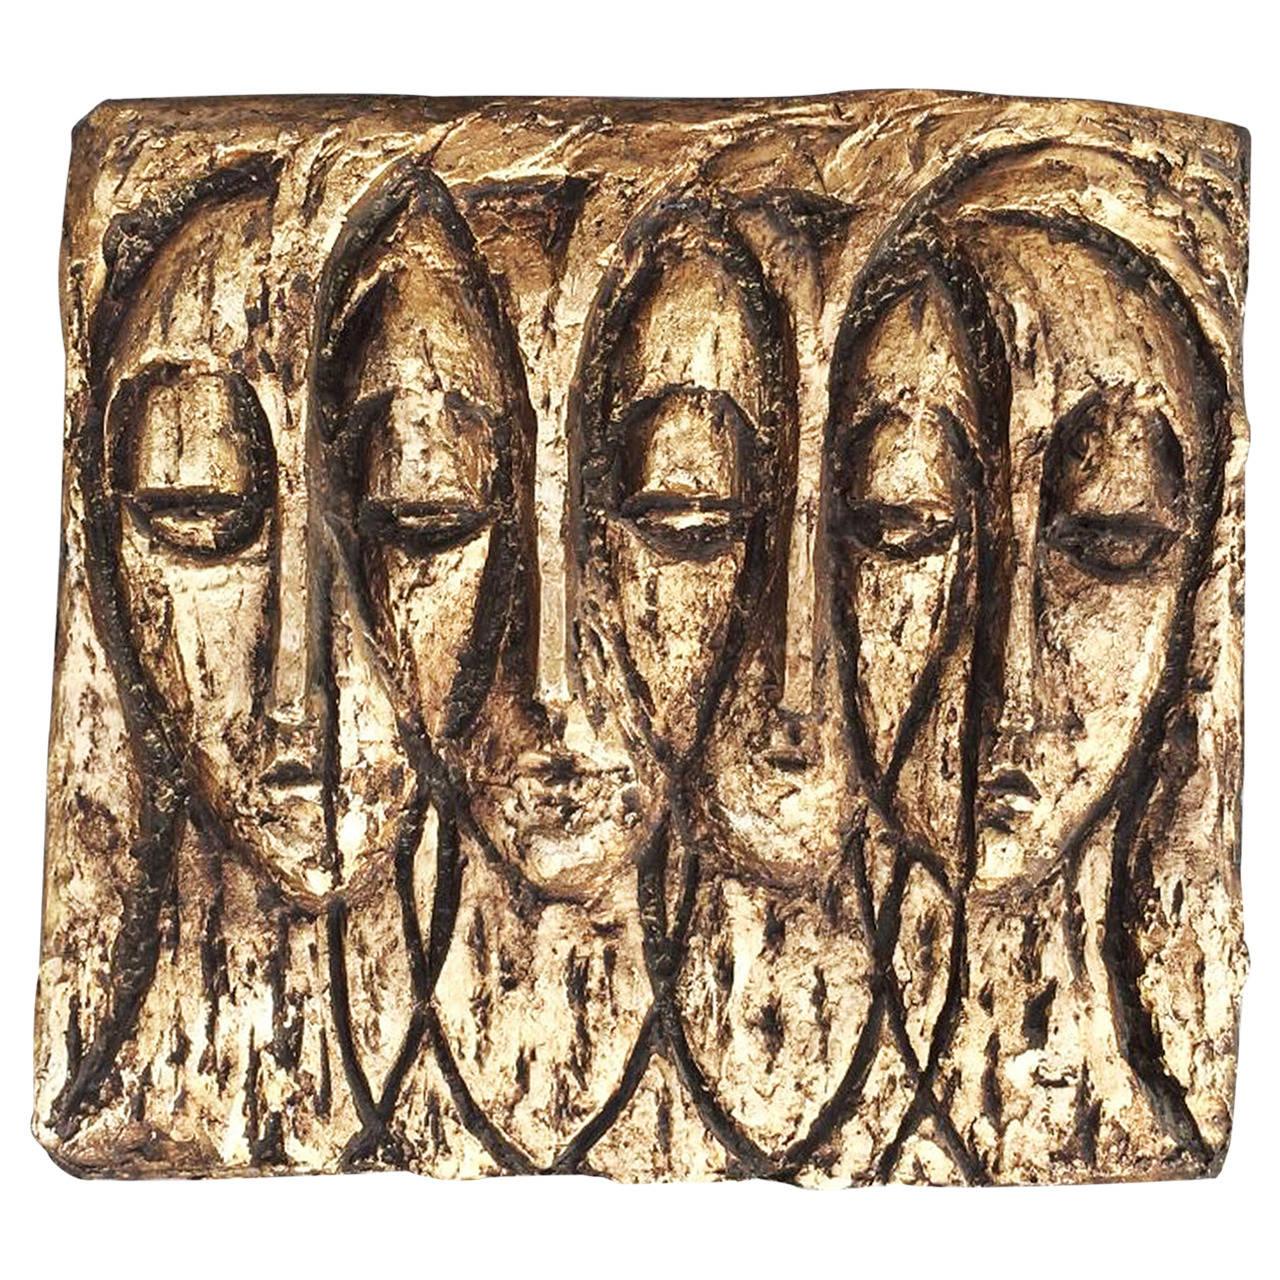 Finesse Originals Gilt Fiberglass Relief Sculpture Circa